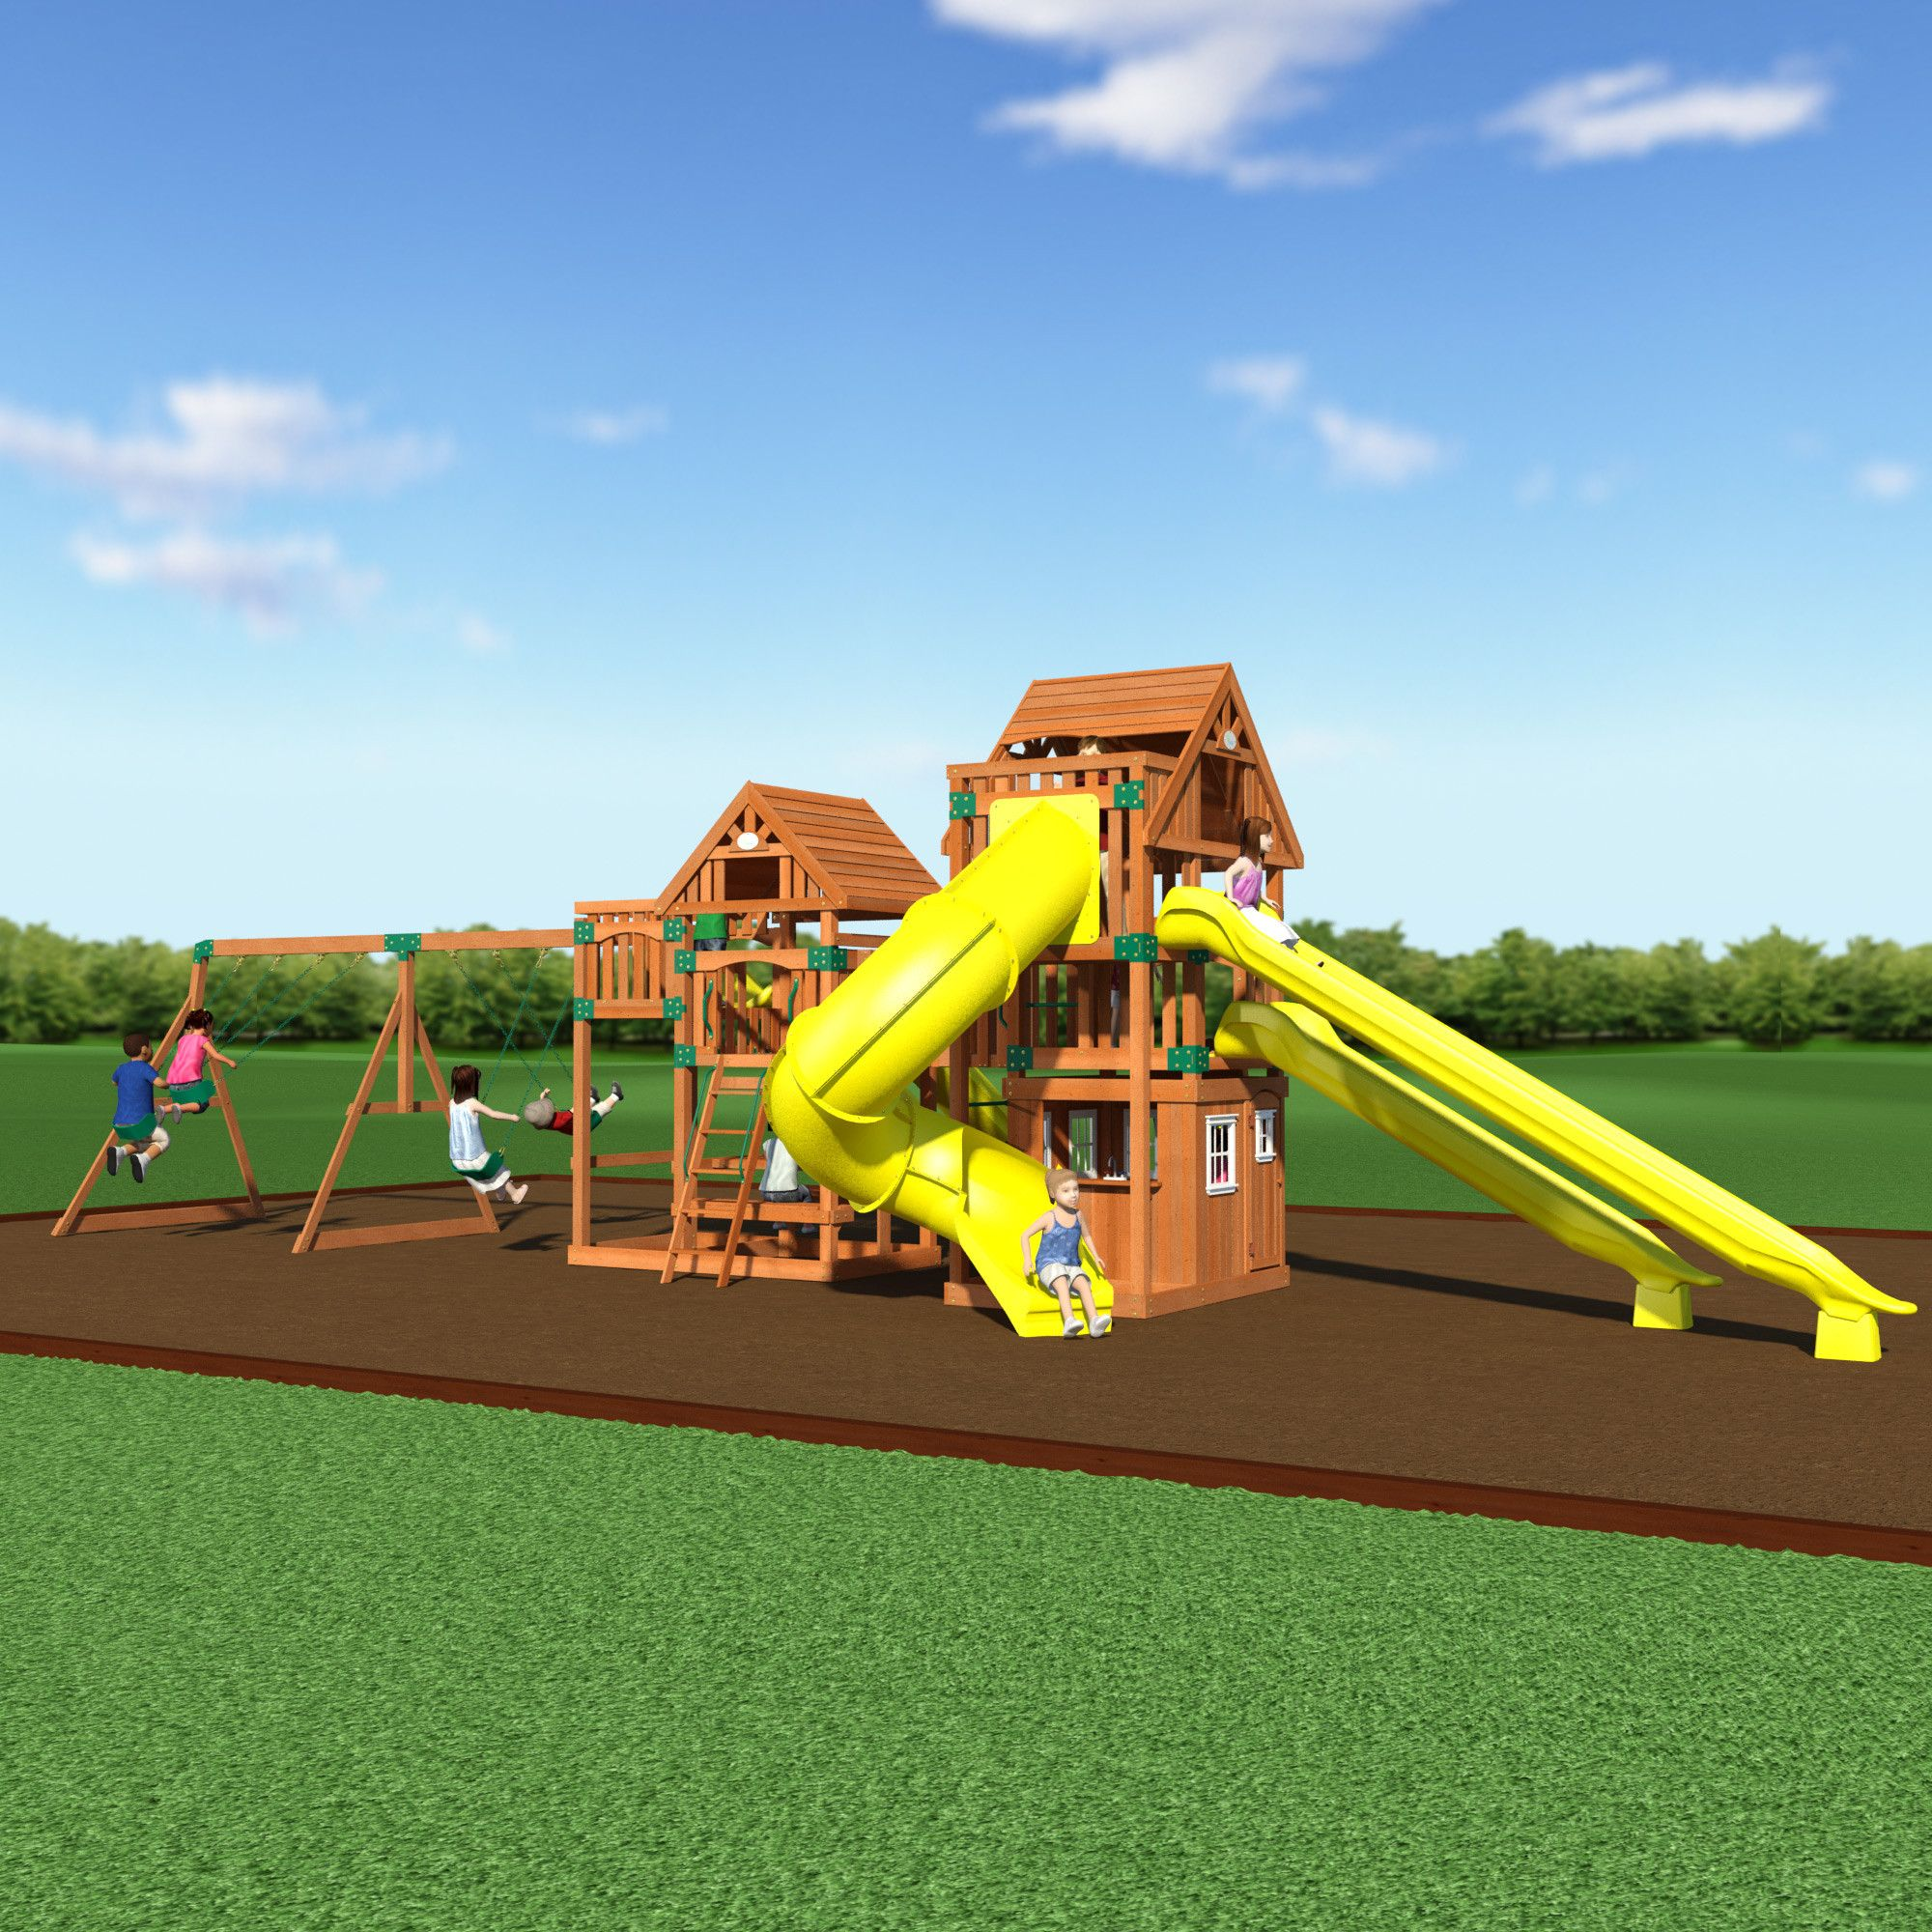 Safari Wooden Swing Set – Backyard Discovery